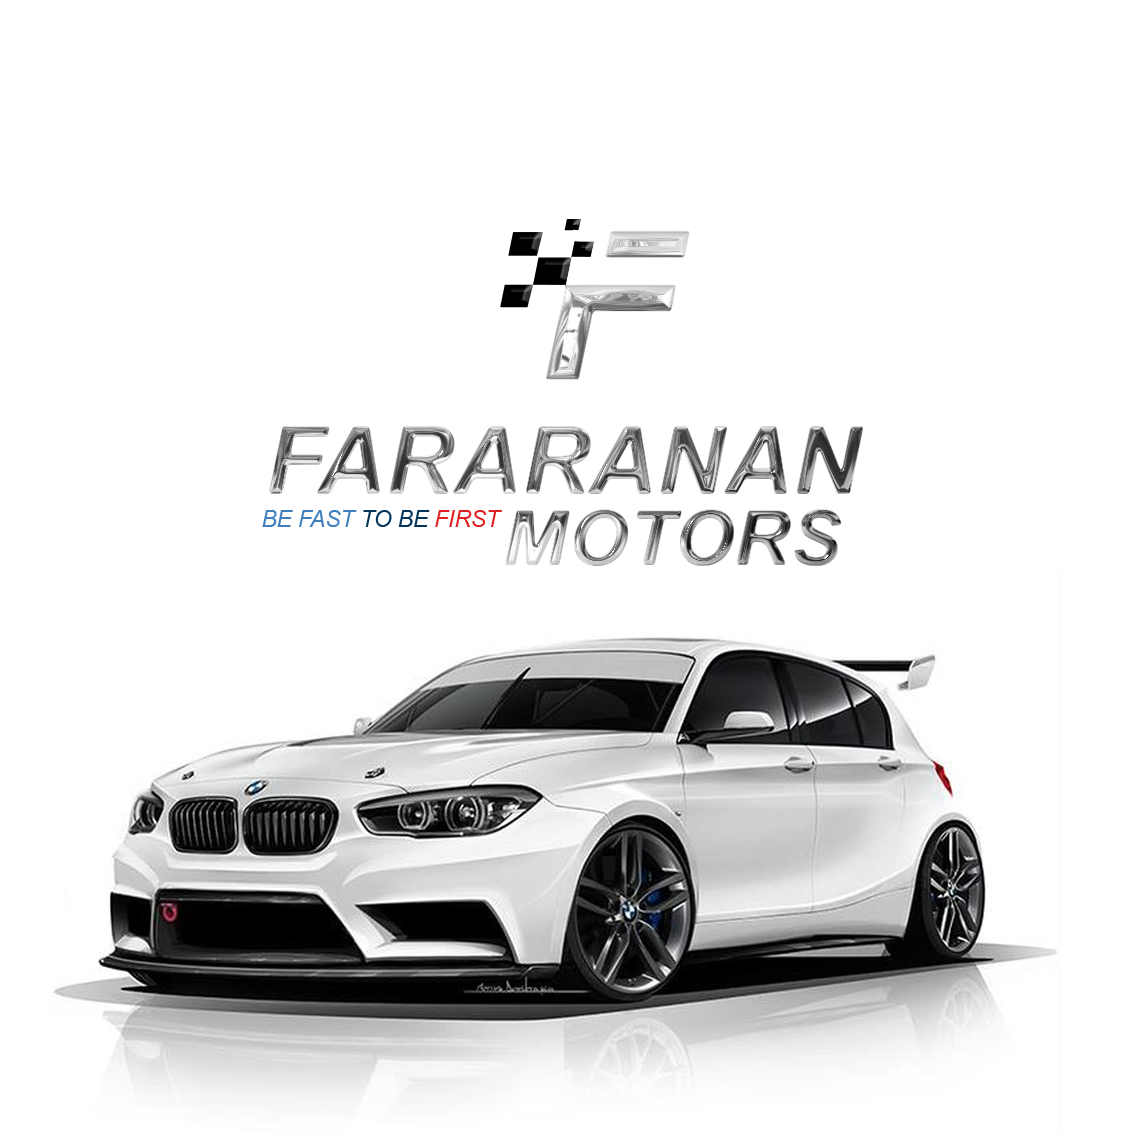 Auto automobile fast logo Motor sports Performance race Racing sports car